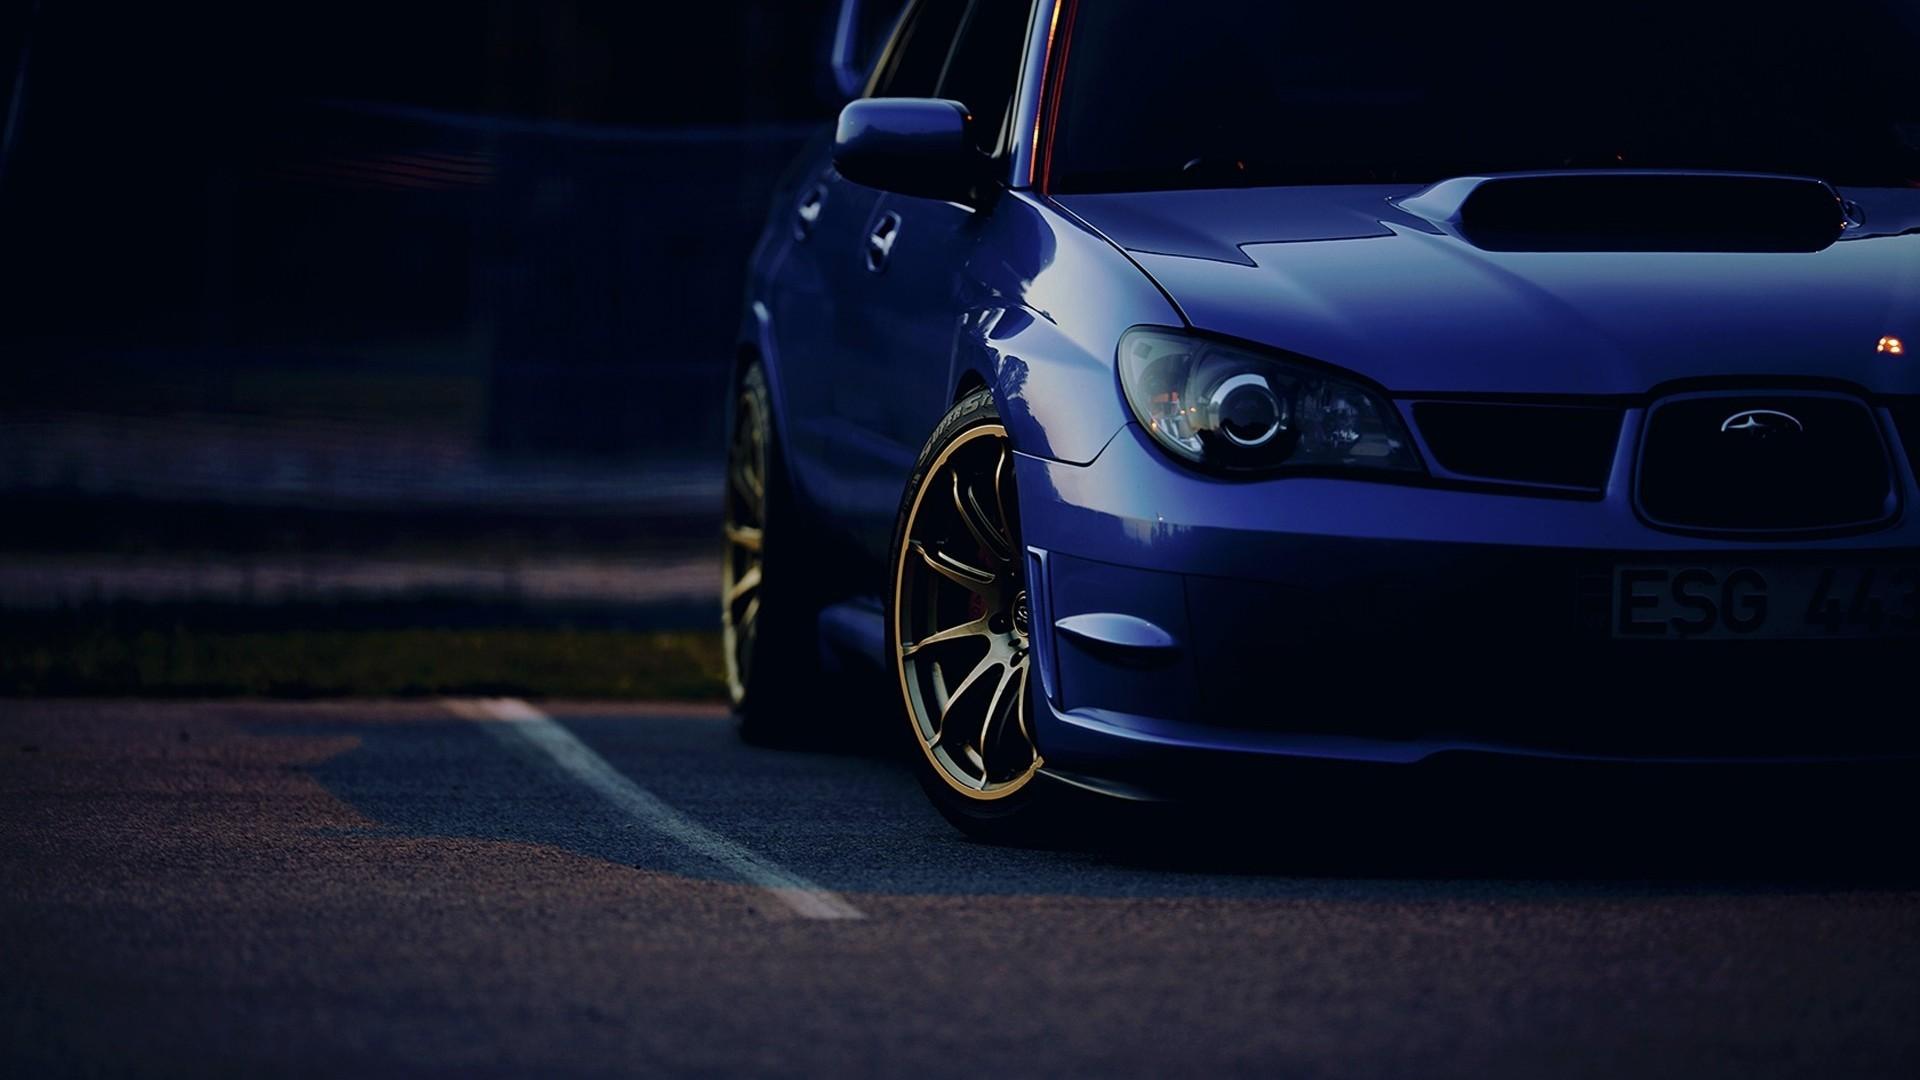 Res: 1920x1080, Subaru Impreza WRX STI Car Wallpaper HD